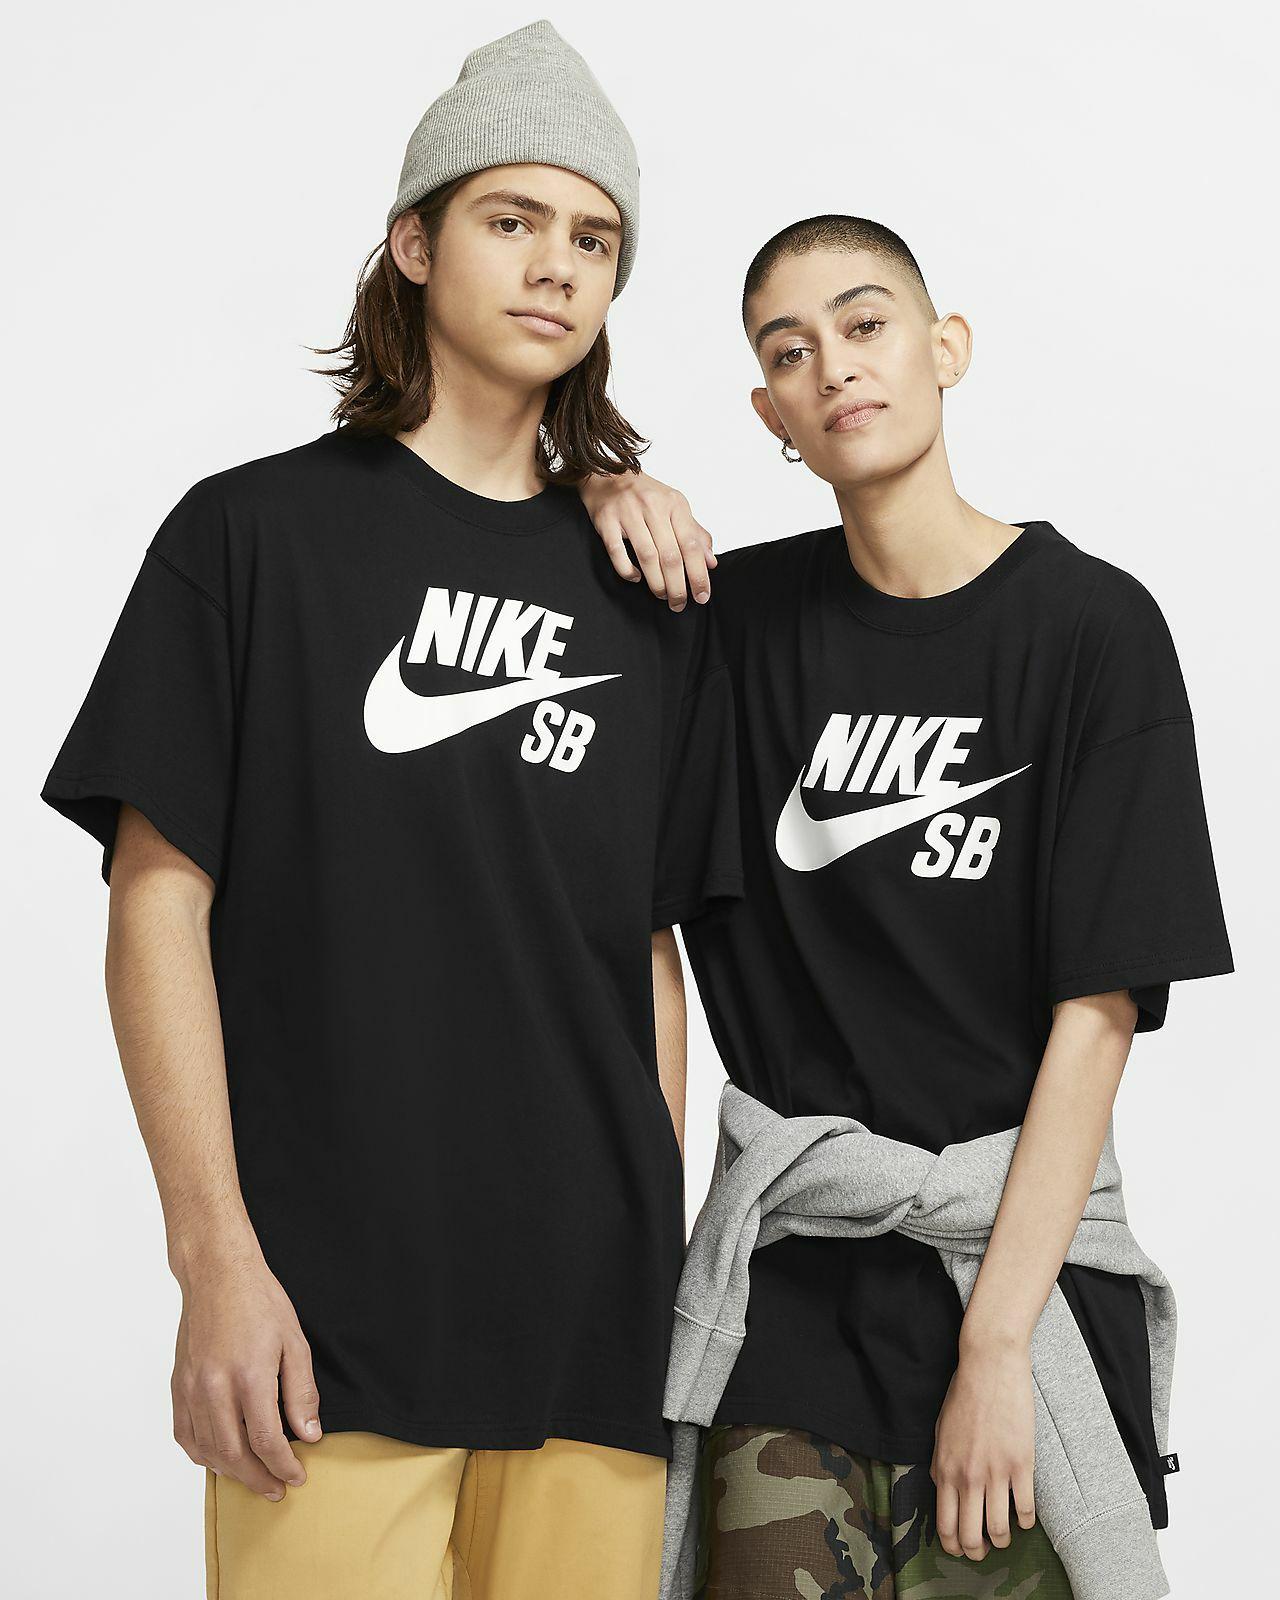 Camiseta Nike tallas S a XL